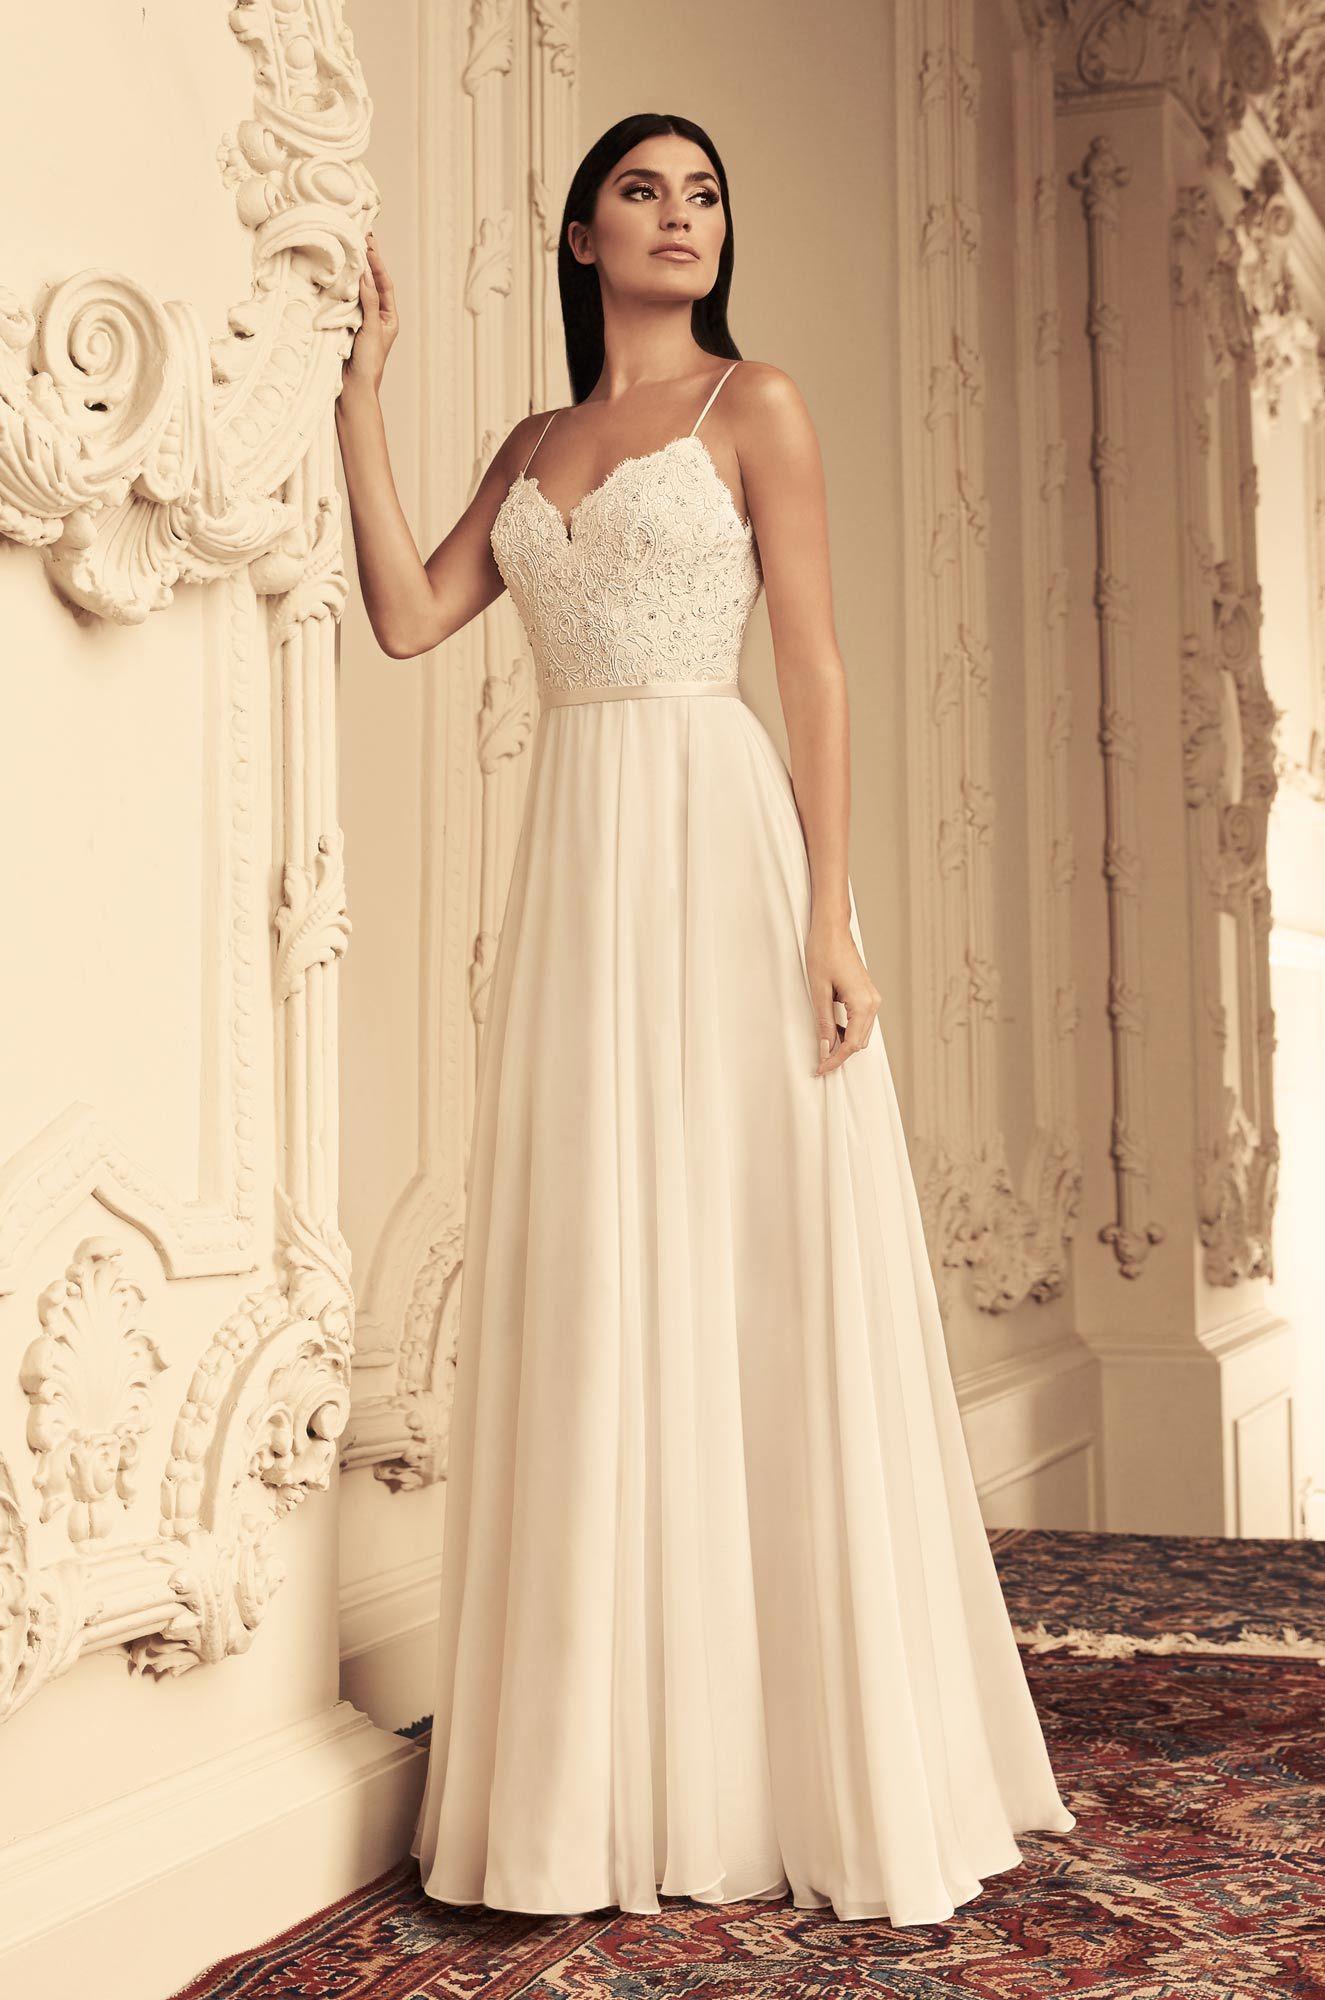 Elegant organza wedding dress style wedding dress kc